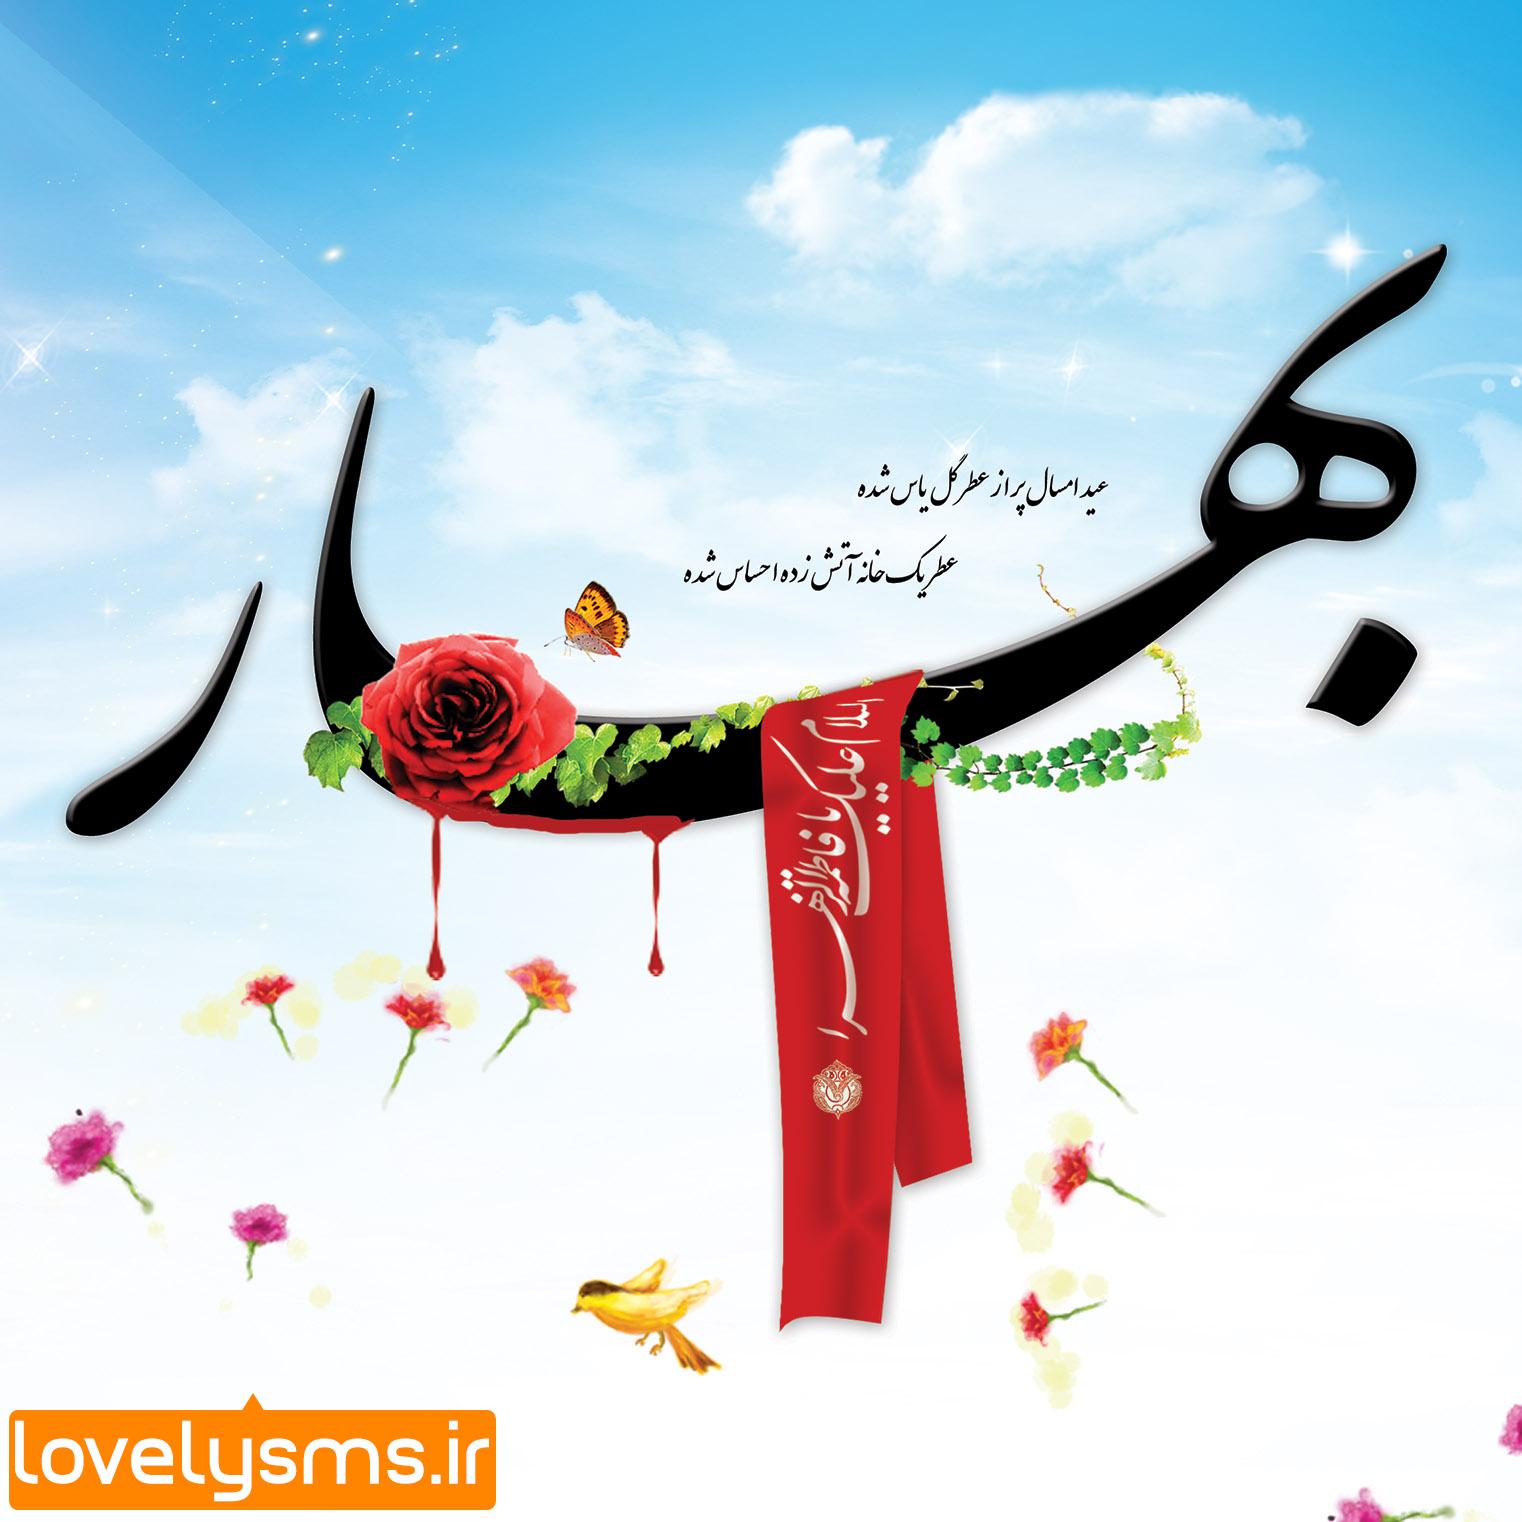 eyd large اس ام اس تبریک عید نوروز و ایام فاطمیه